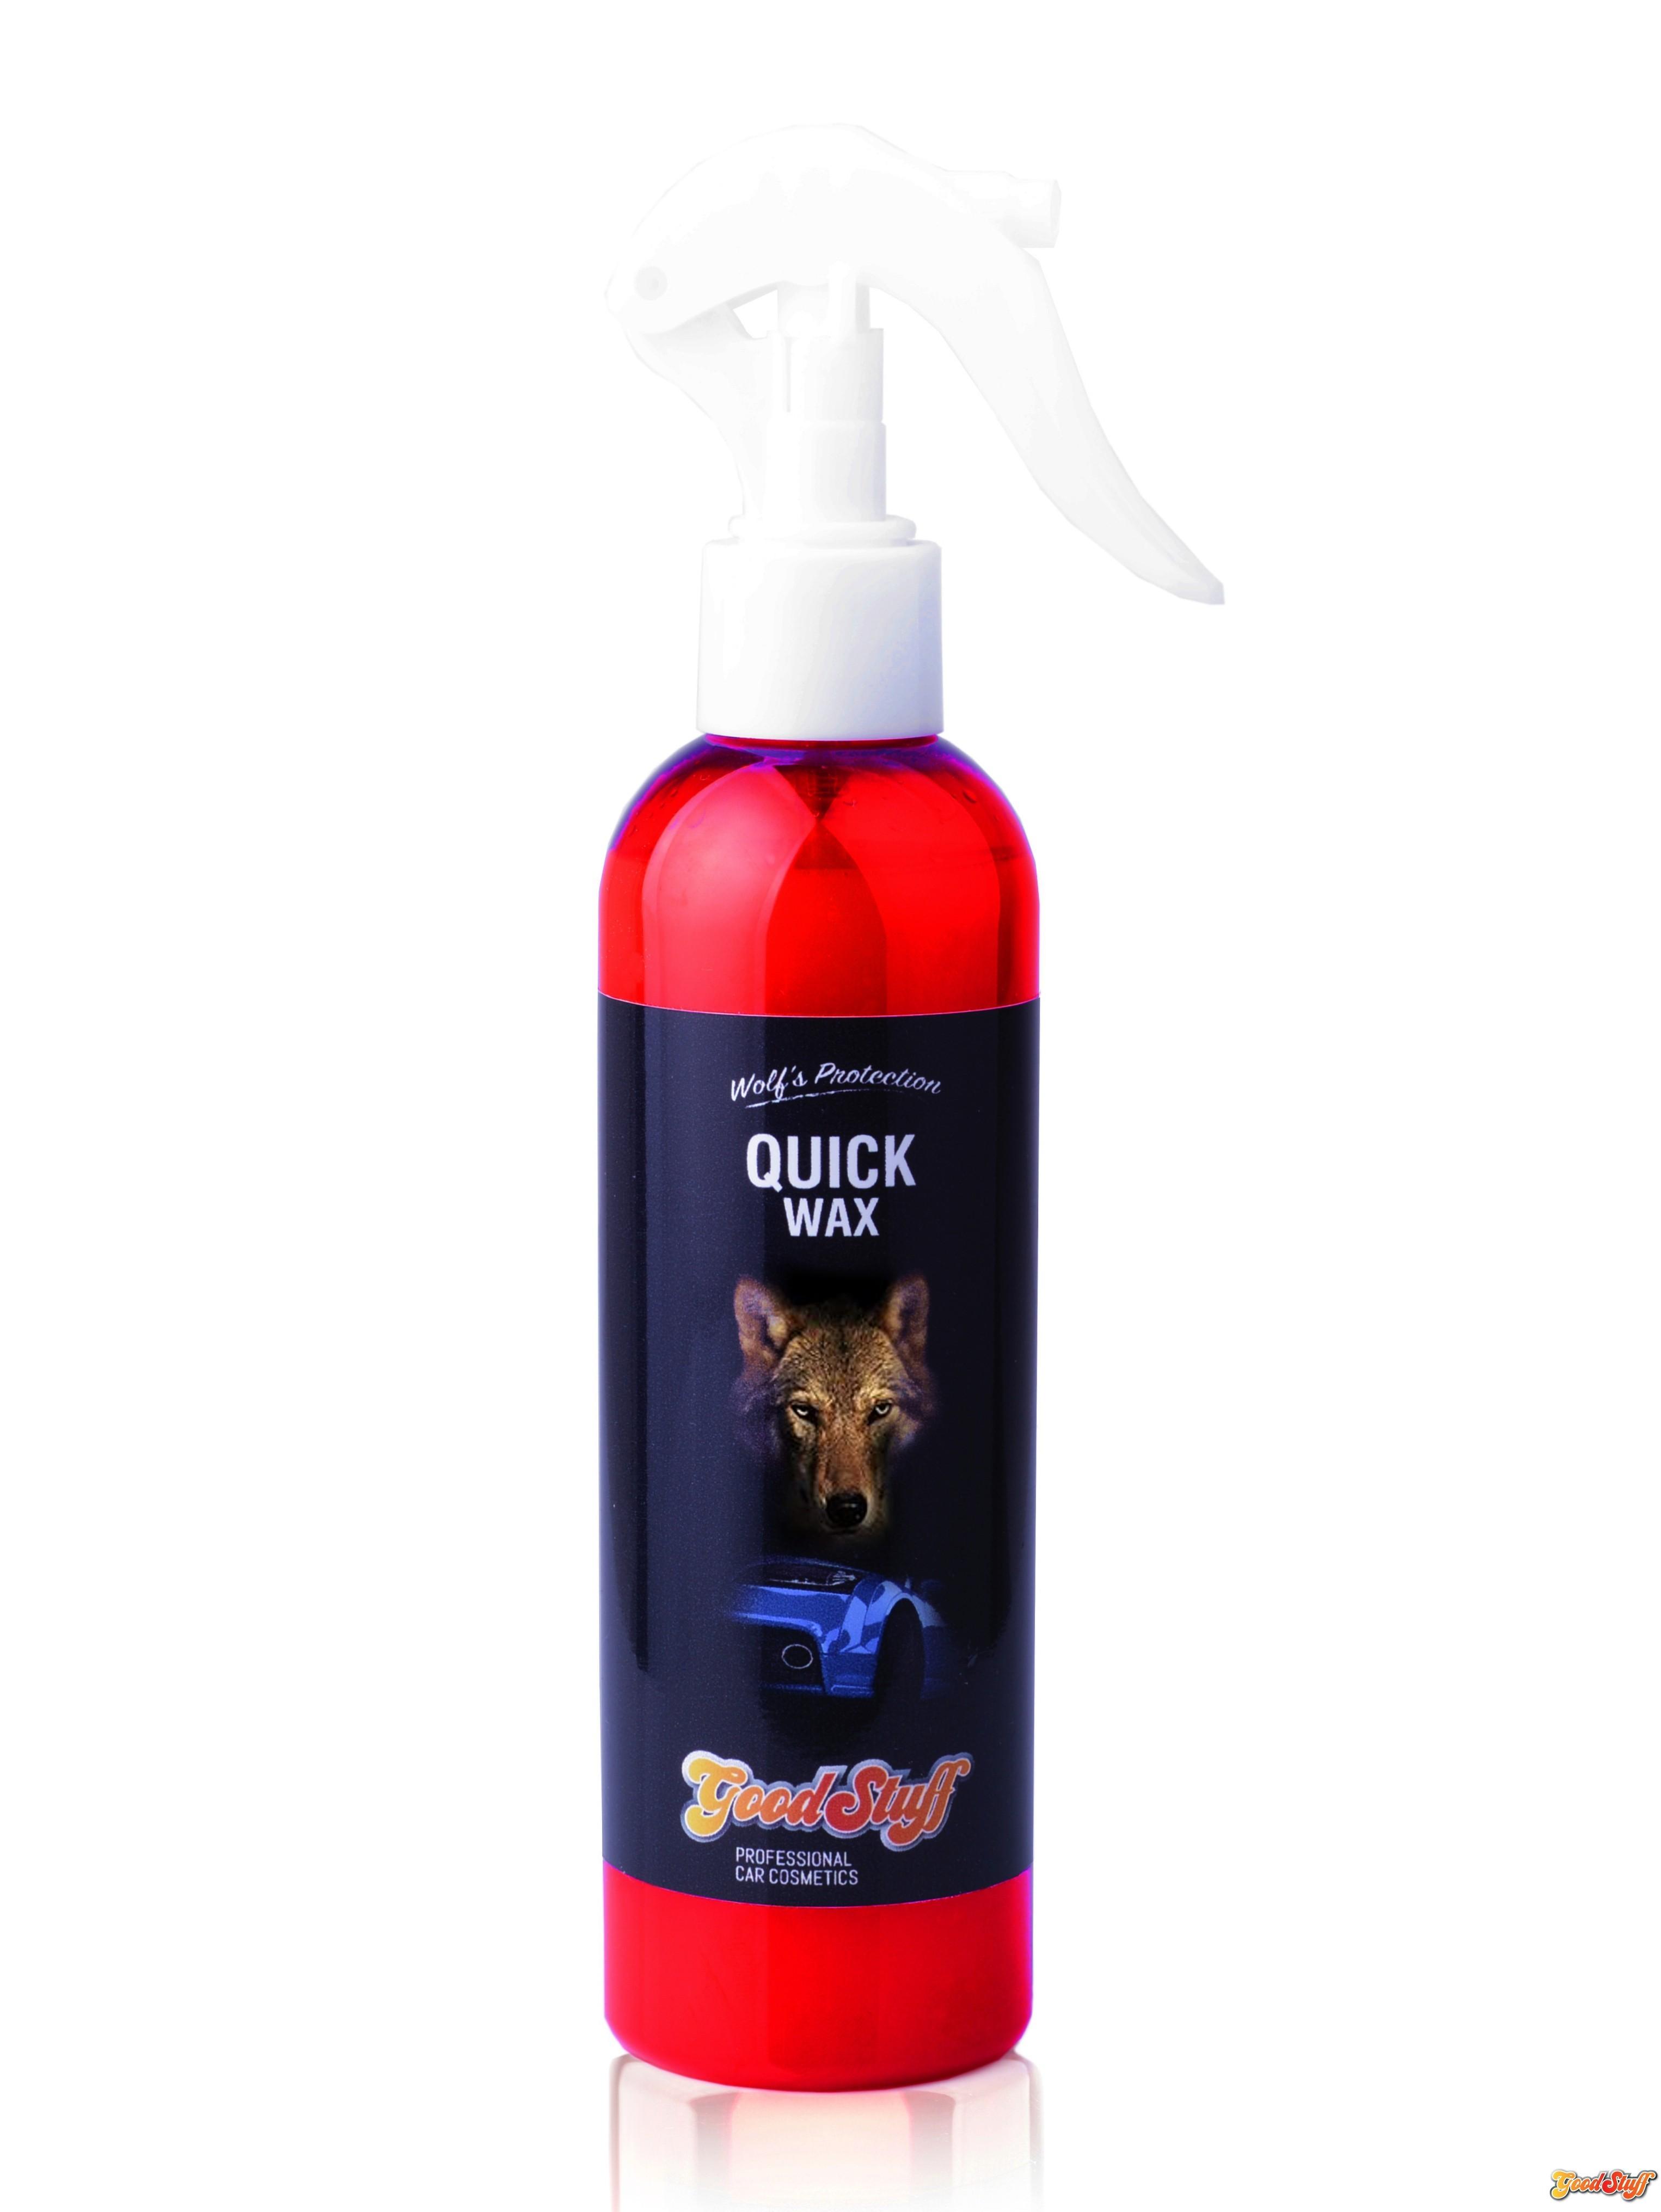 Good Stuff Wolf's Protection Quick Wax 250 ml